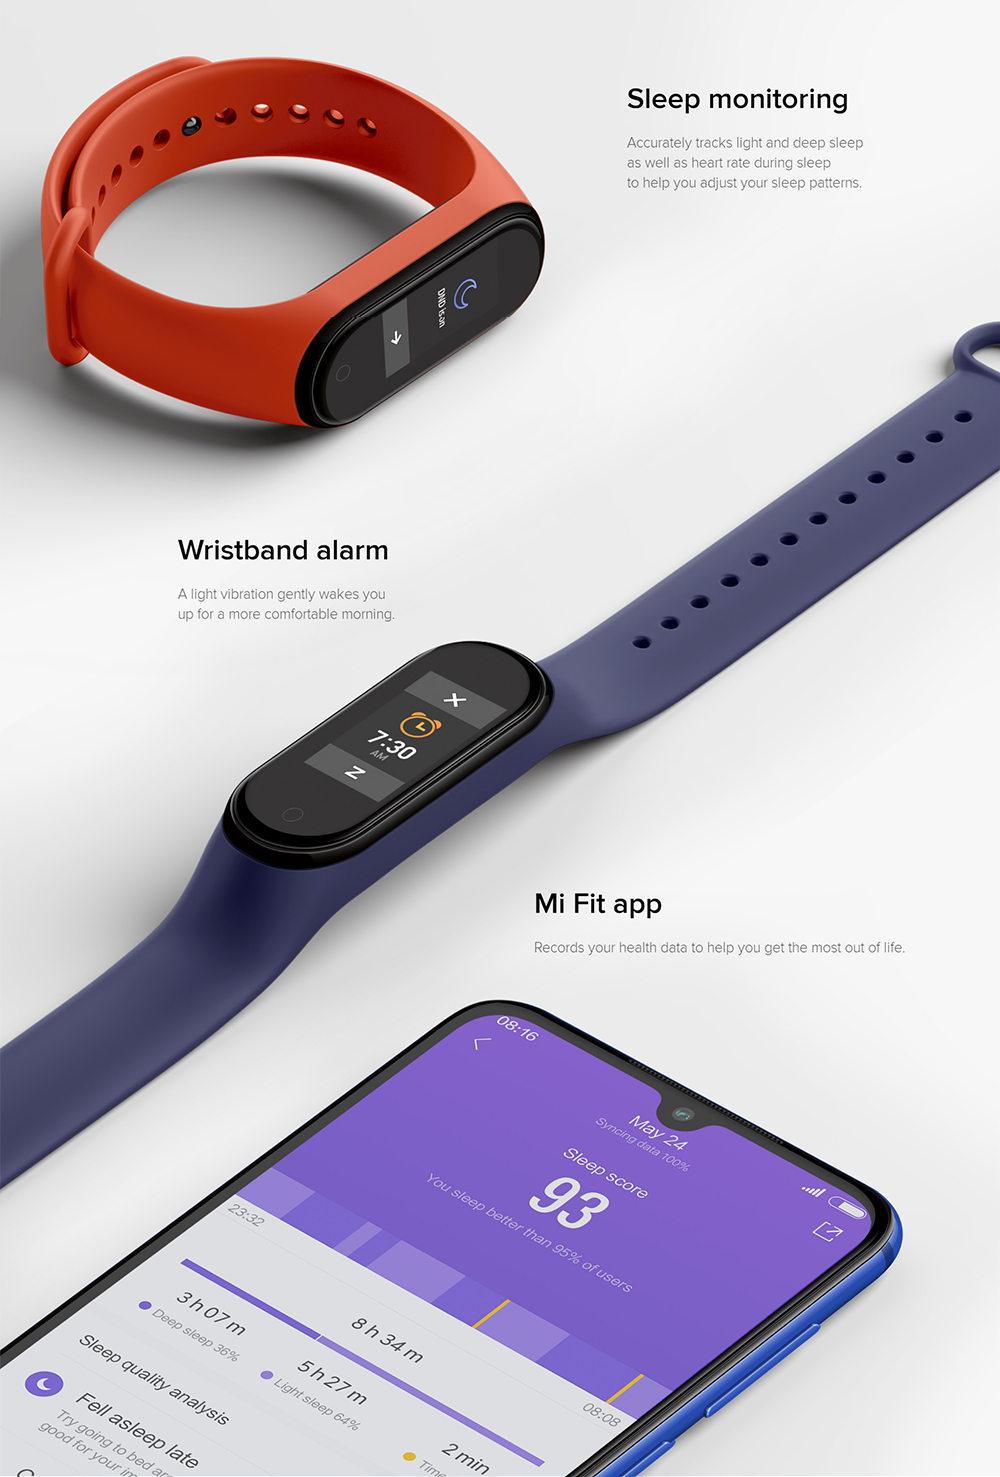 xiaomi mi band 4 smart wristband for sale